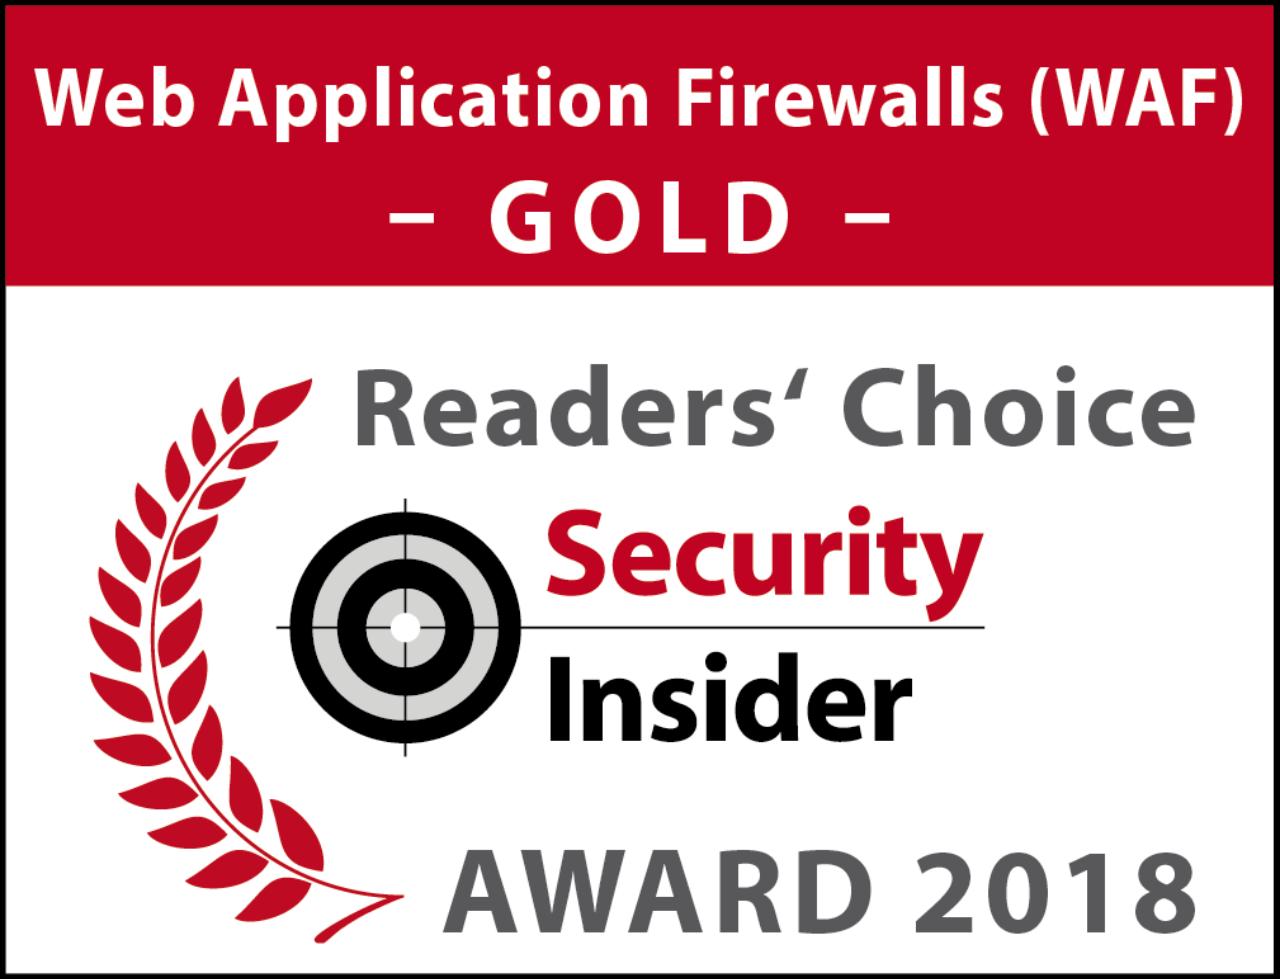 Cybersecurity-Awards-2018-SEI-Gold-2018-Web-Application-Firewalls.png